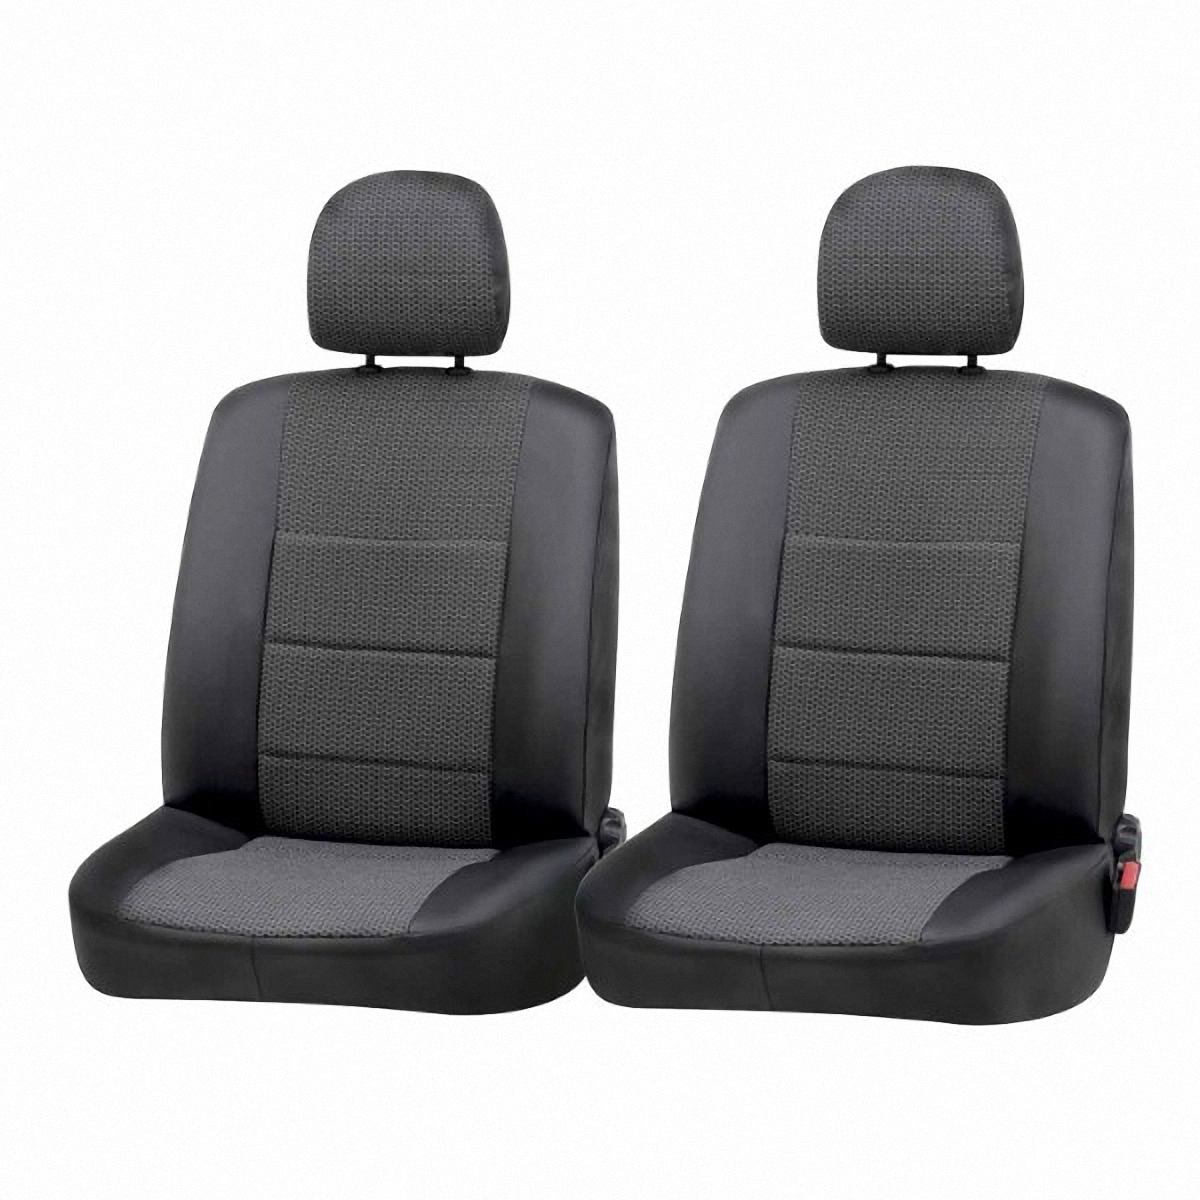 Чехол на сиденье Skyway Kia Rio (седан), цвет: темно-серый. Kia1-2K чехол на сиденье skyway toyota corolla седан ty1 2k